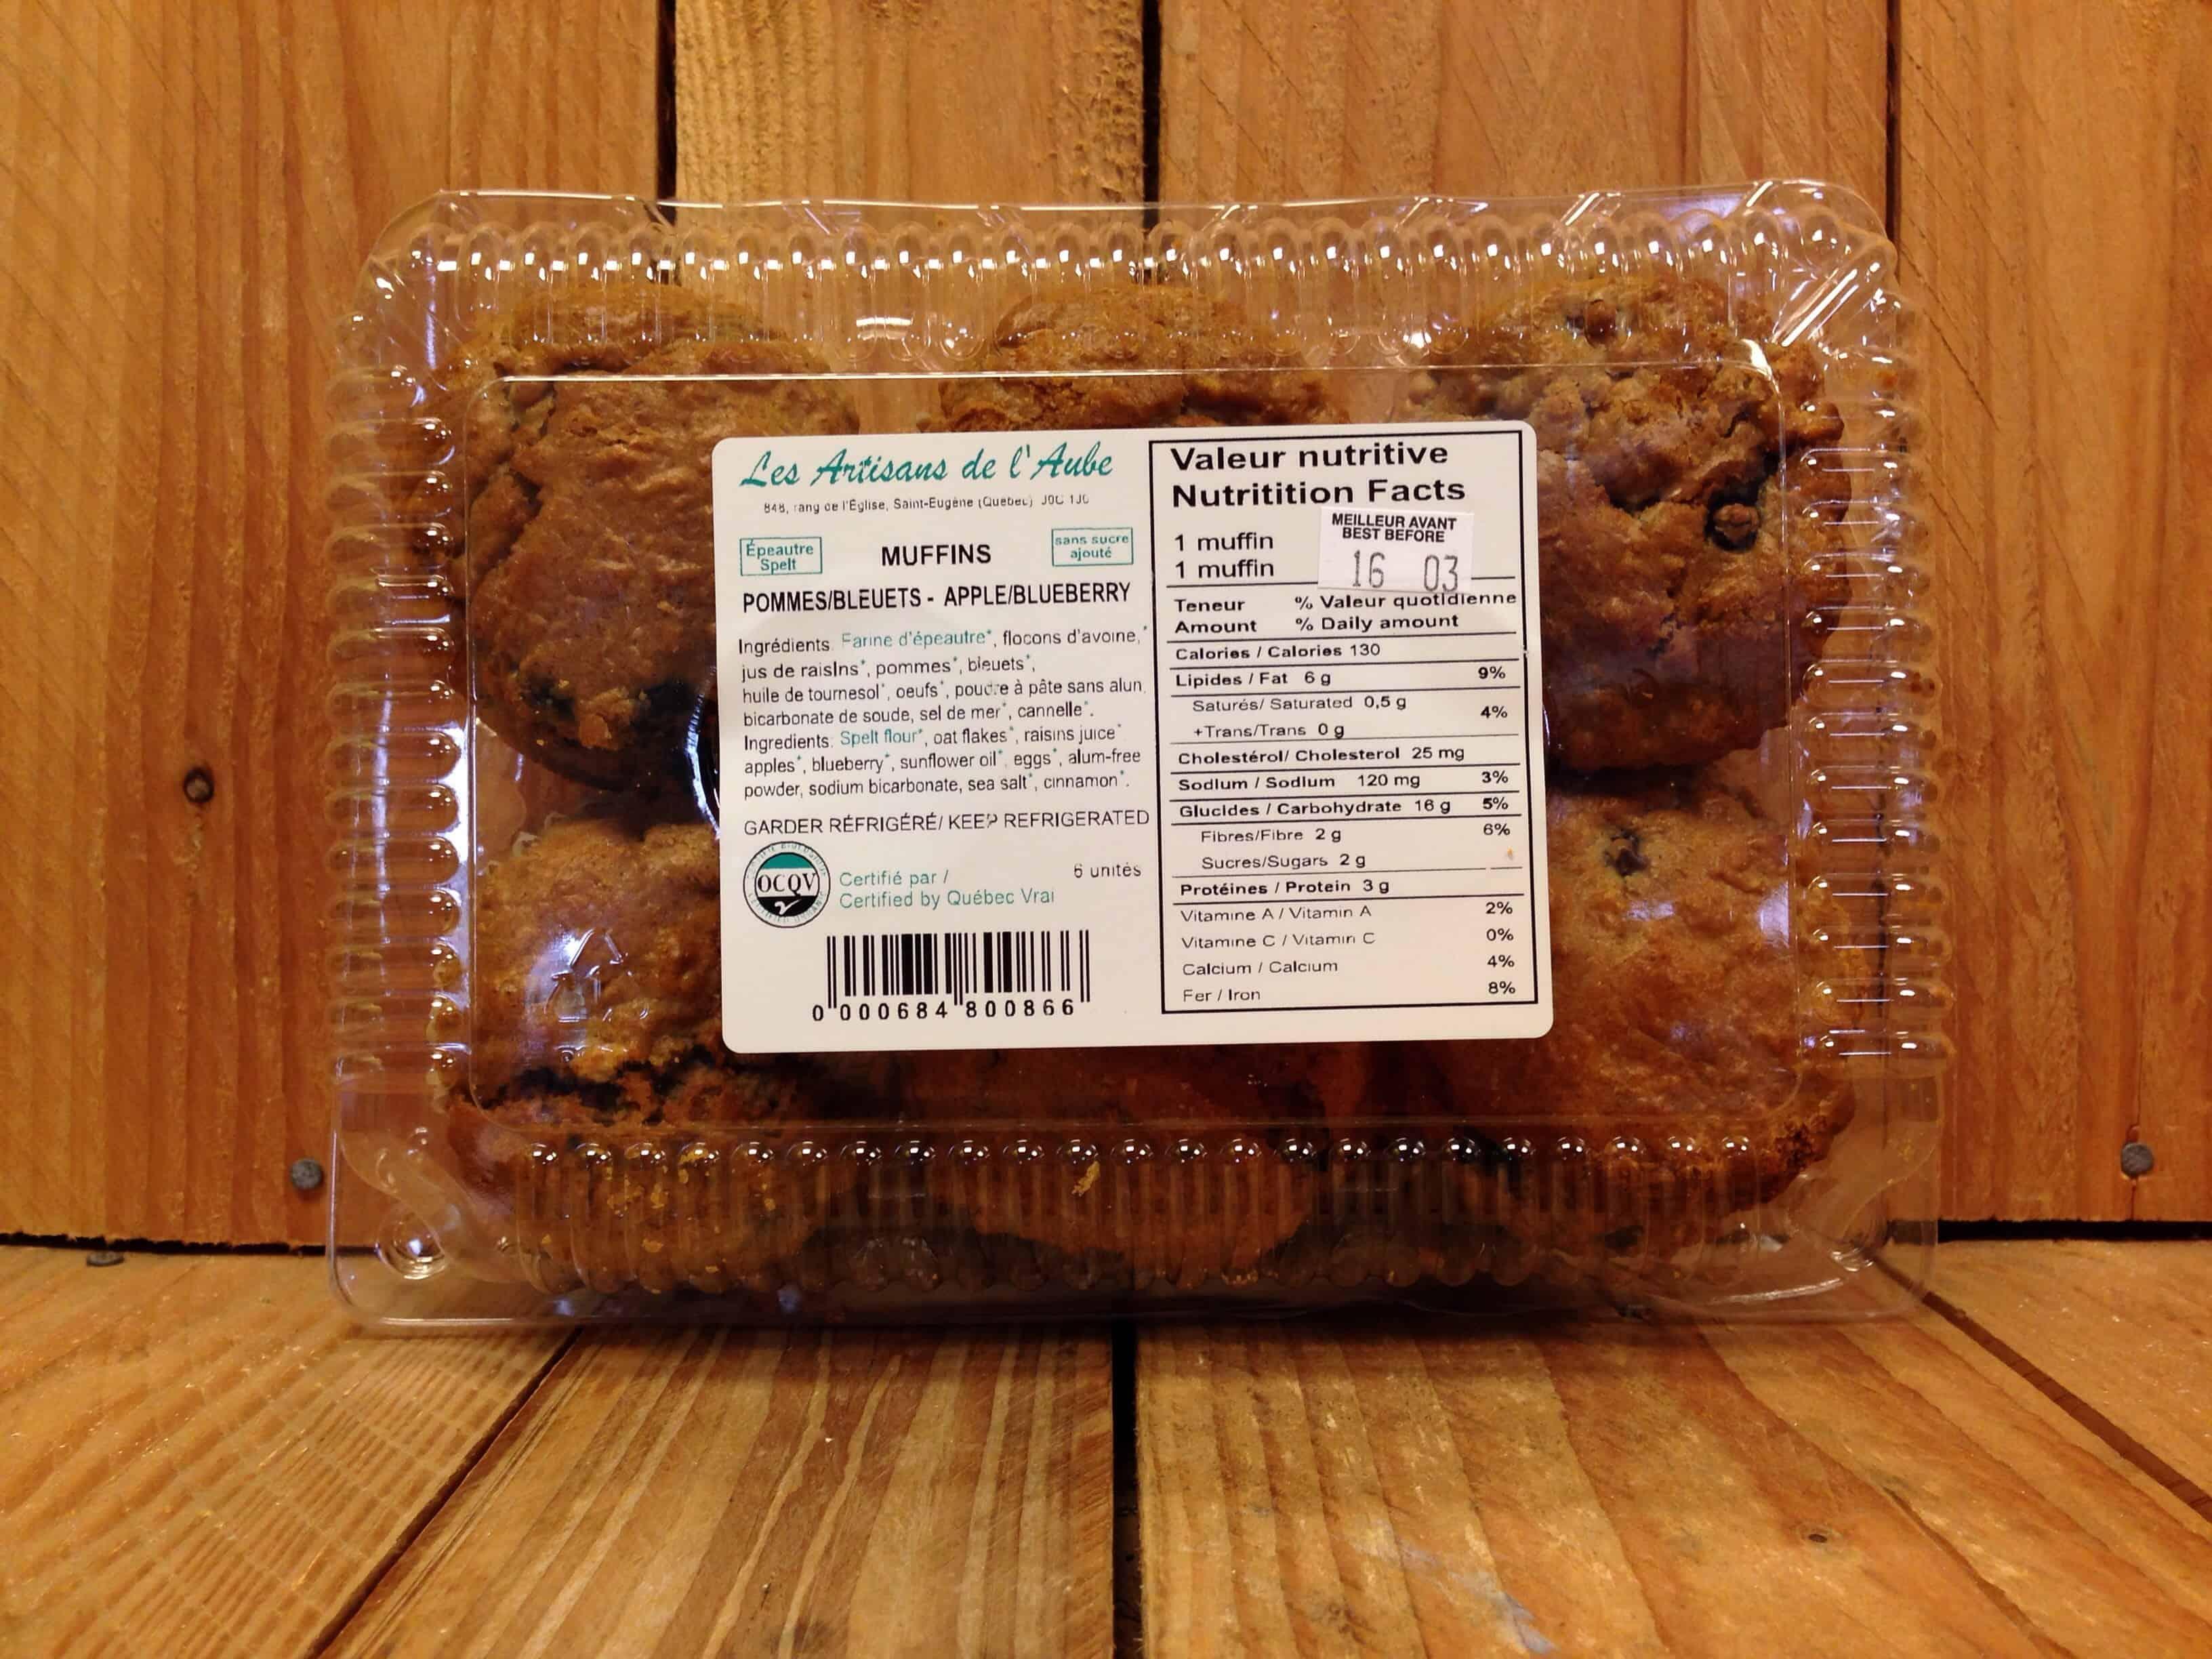 Artisans de l'Aube – Muffins – Sugar-Free Apple Blueberry Spelt (Pkg/6)